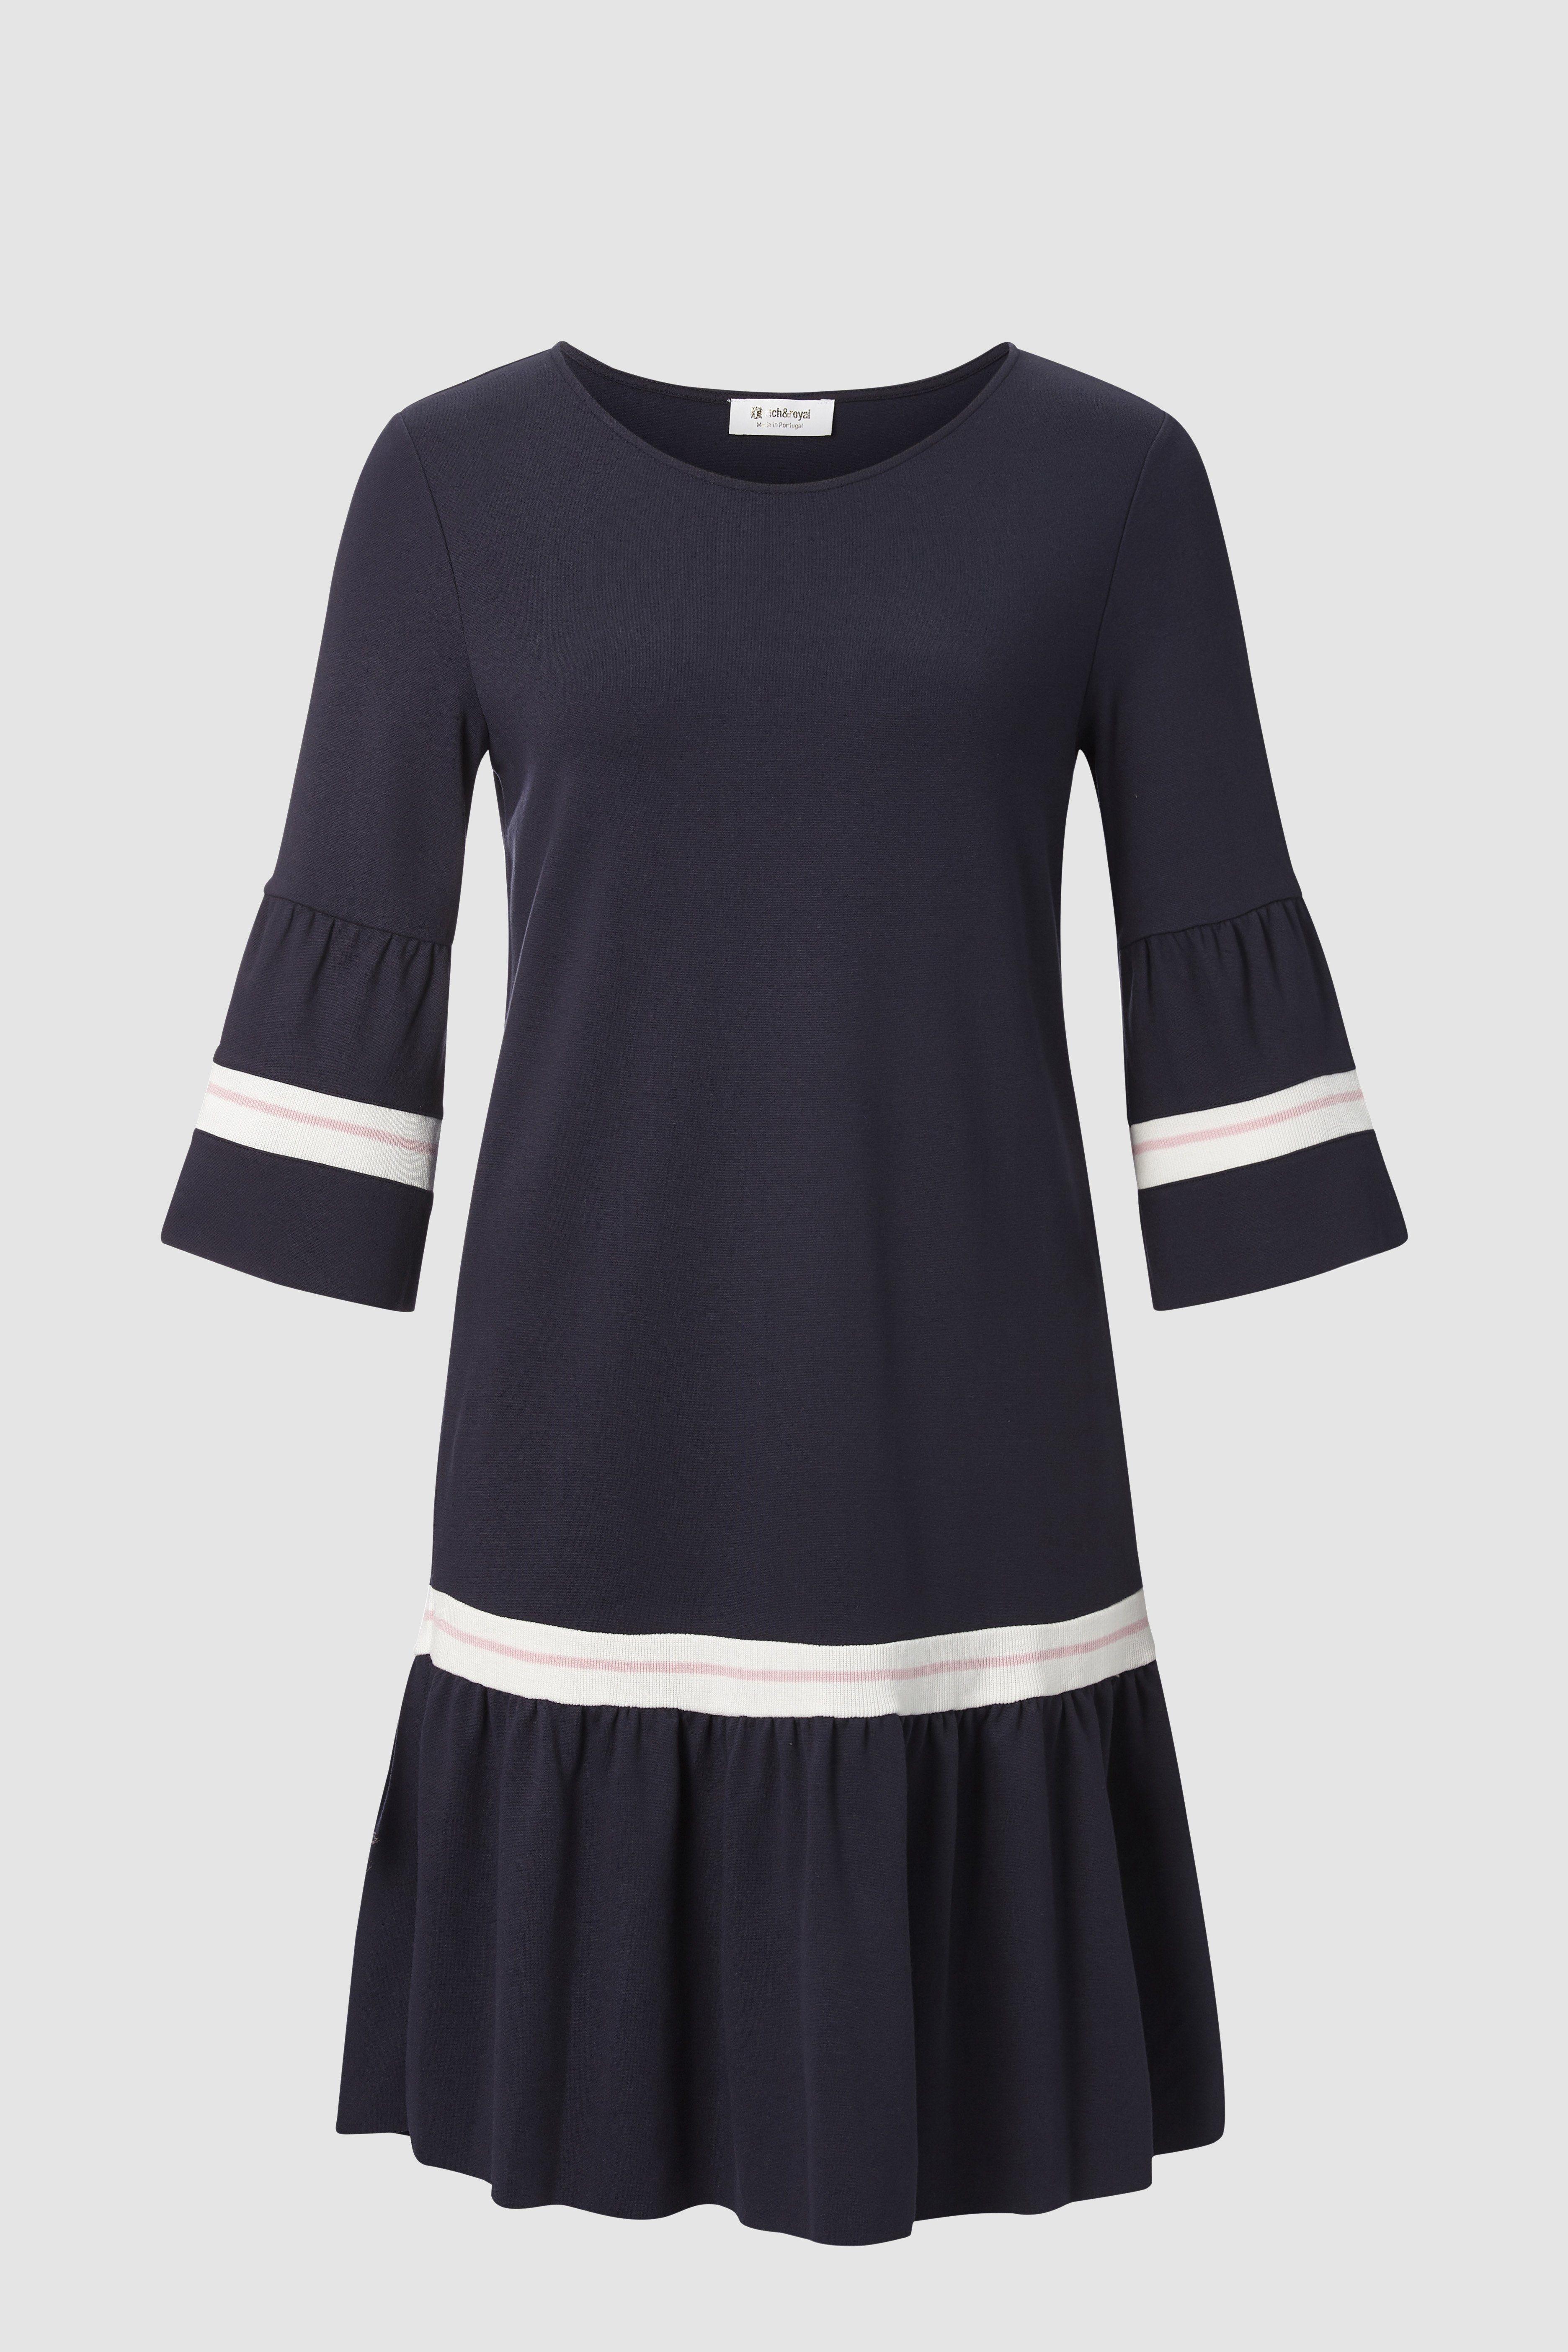 Kleid Mit Peplum Skirts Dresses Collection Rich Royal Kleider Tageskleider Rich Royal